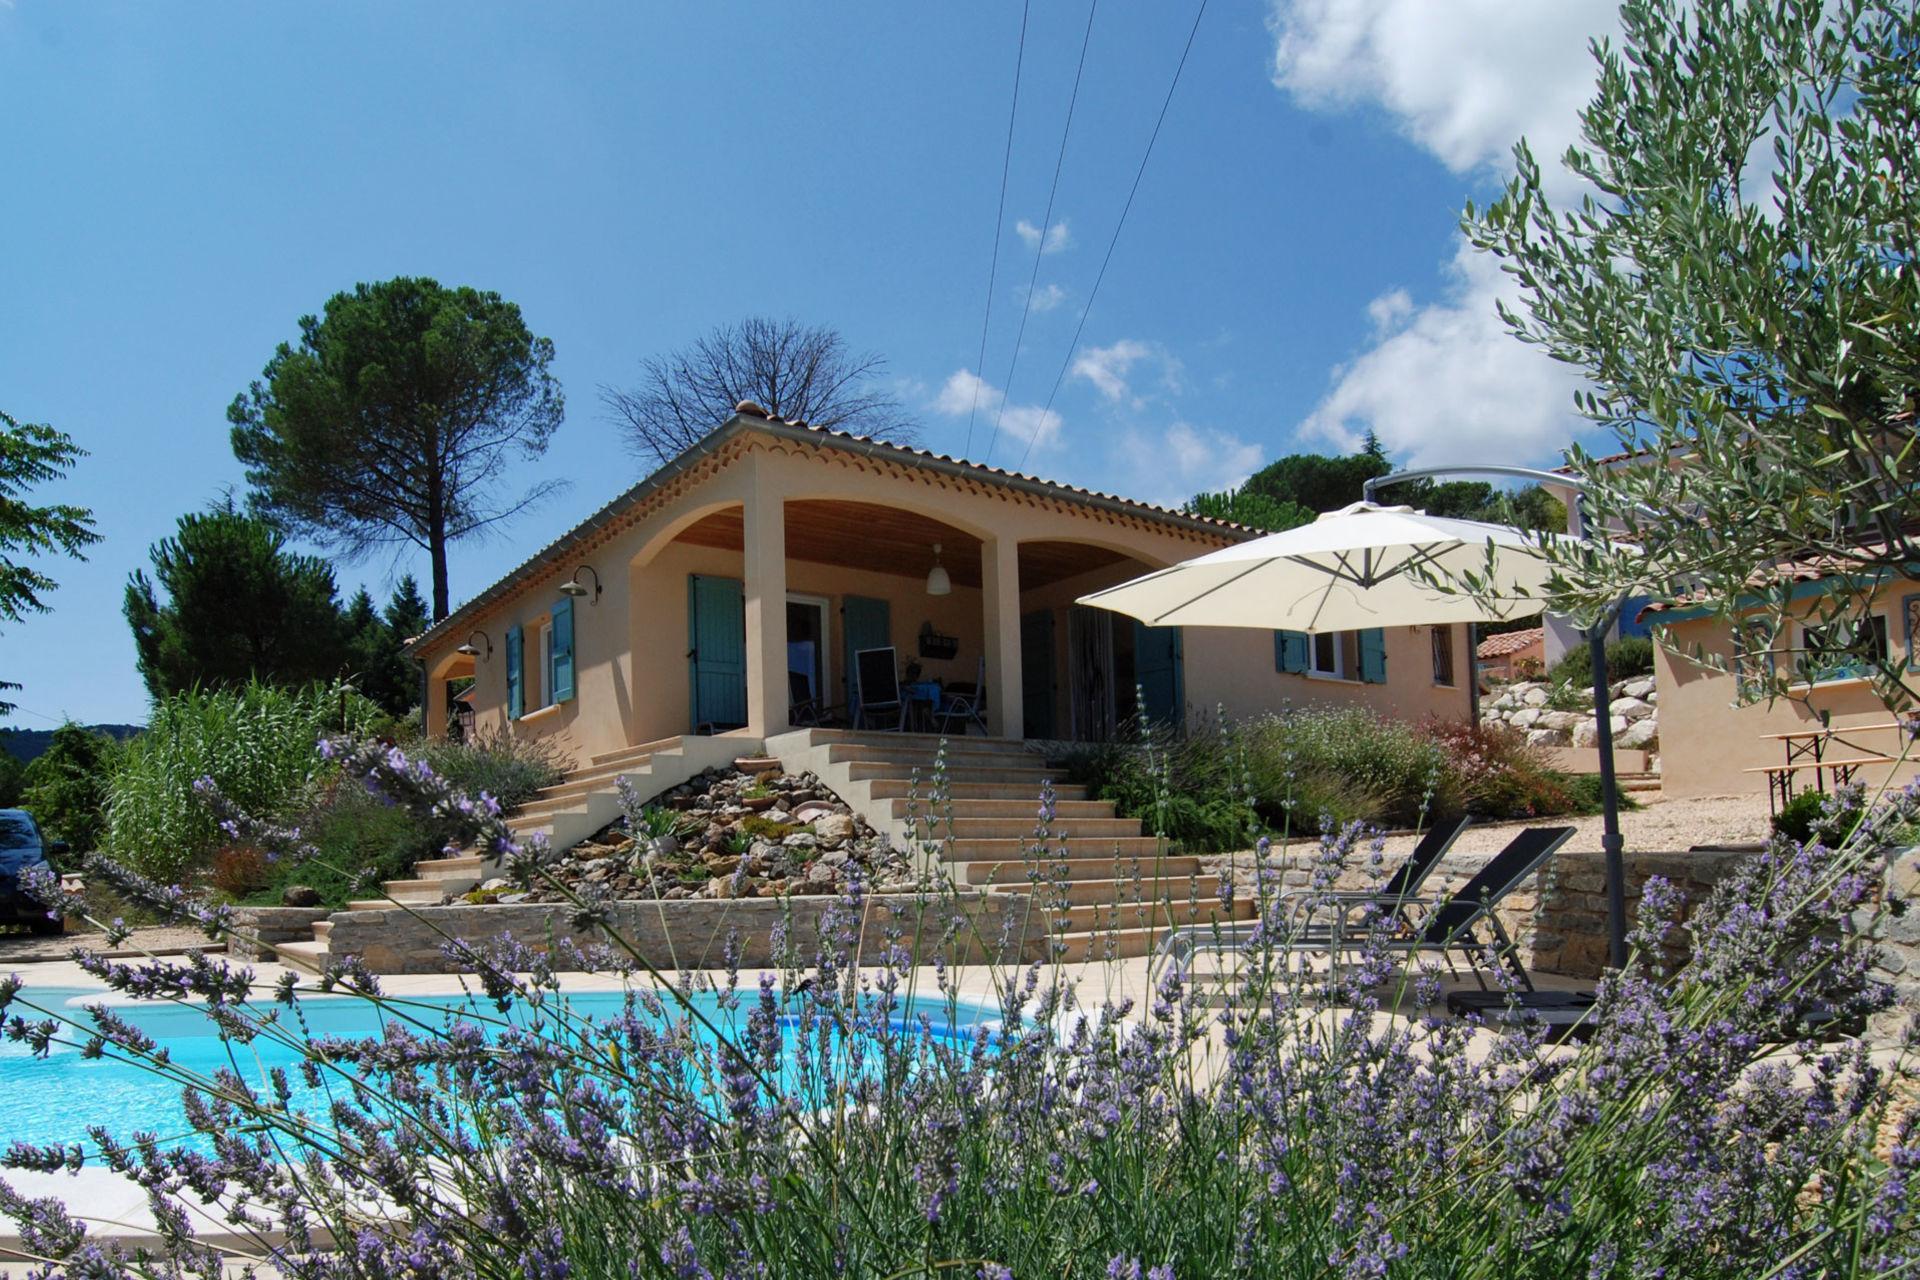 bekijk vakantiehuis villa l 39 esprit du sud in gard. Black Bedroom Furniture Sets. Home Design Ideas